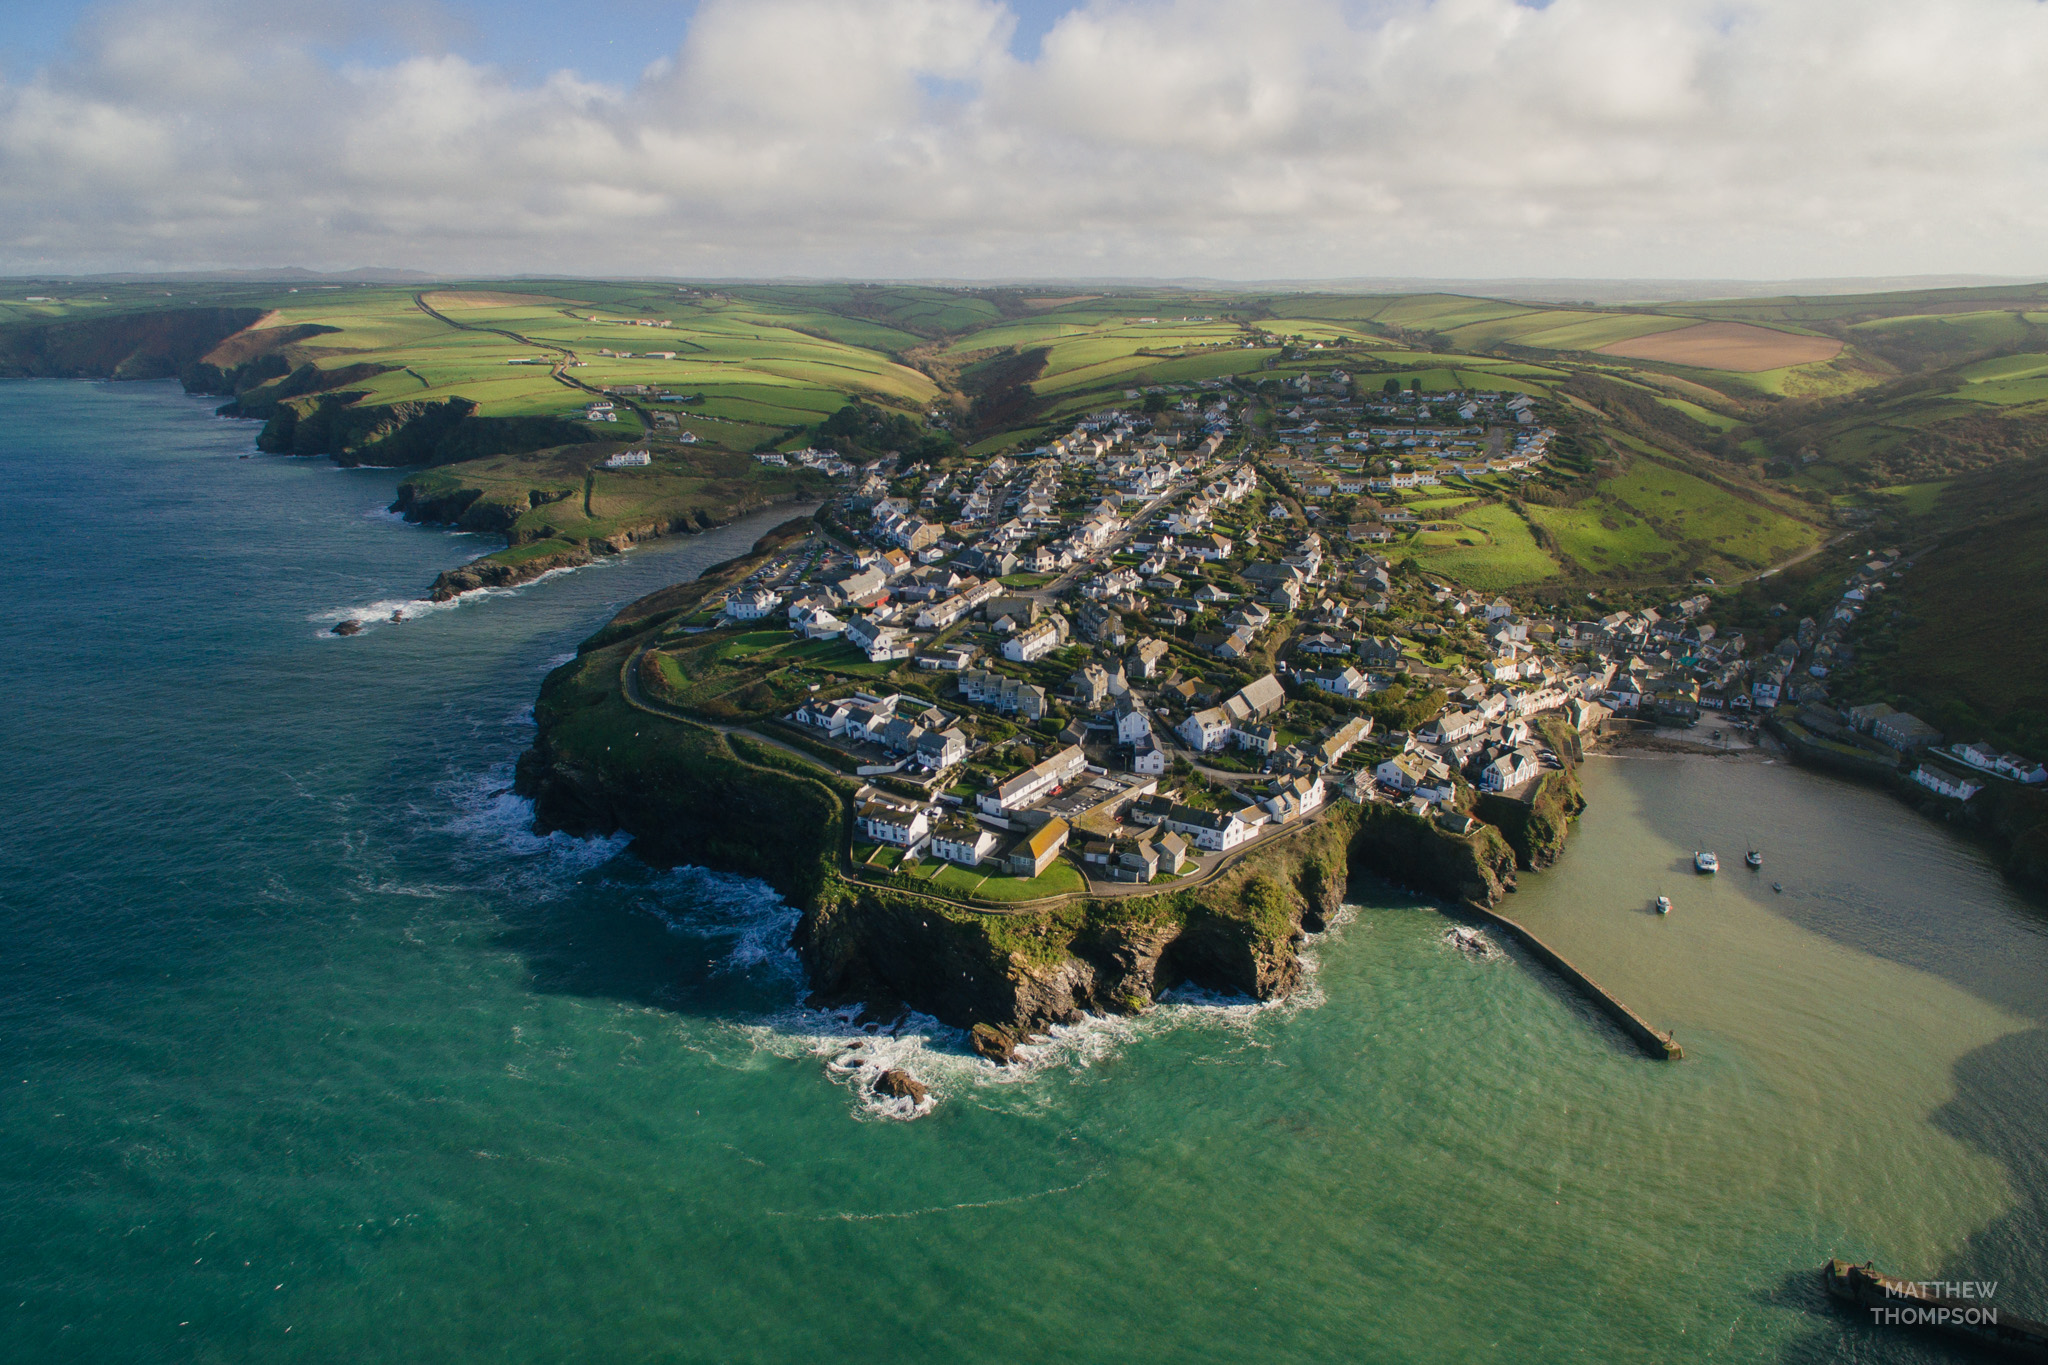 151107-Cornwall-Aerial-10-W.jpg